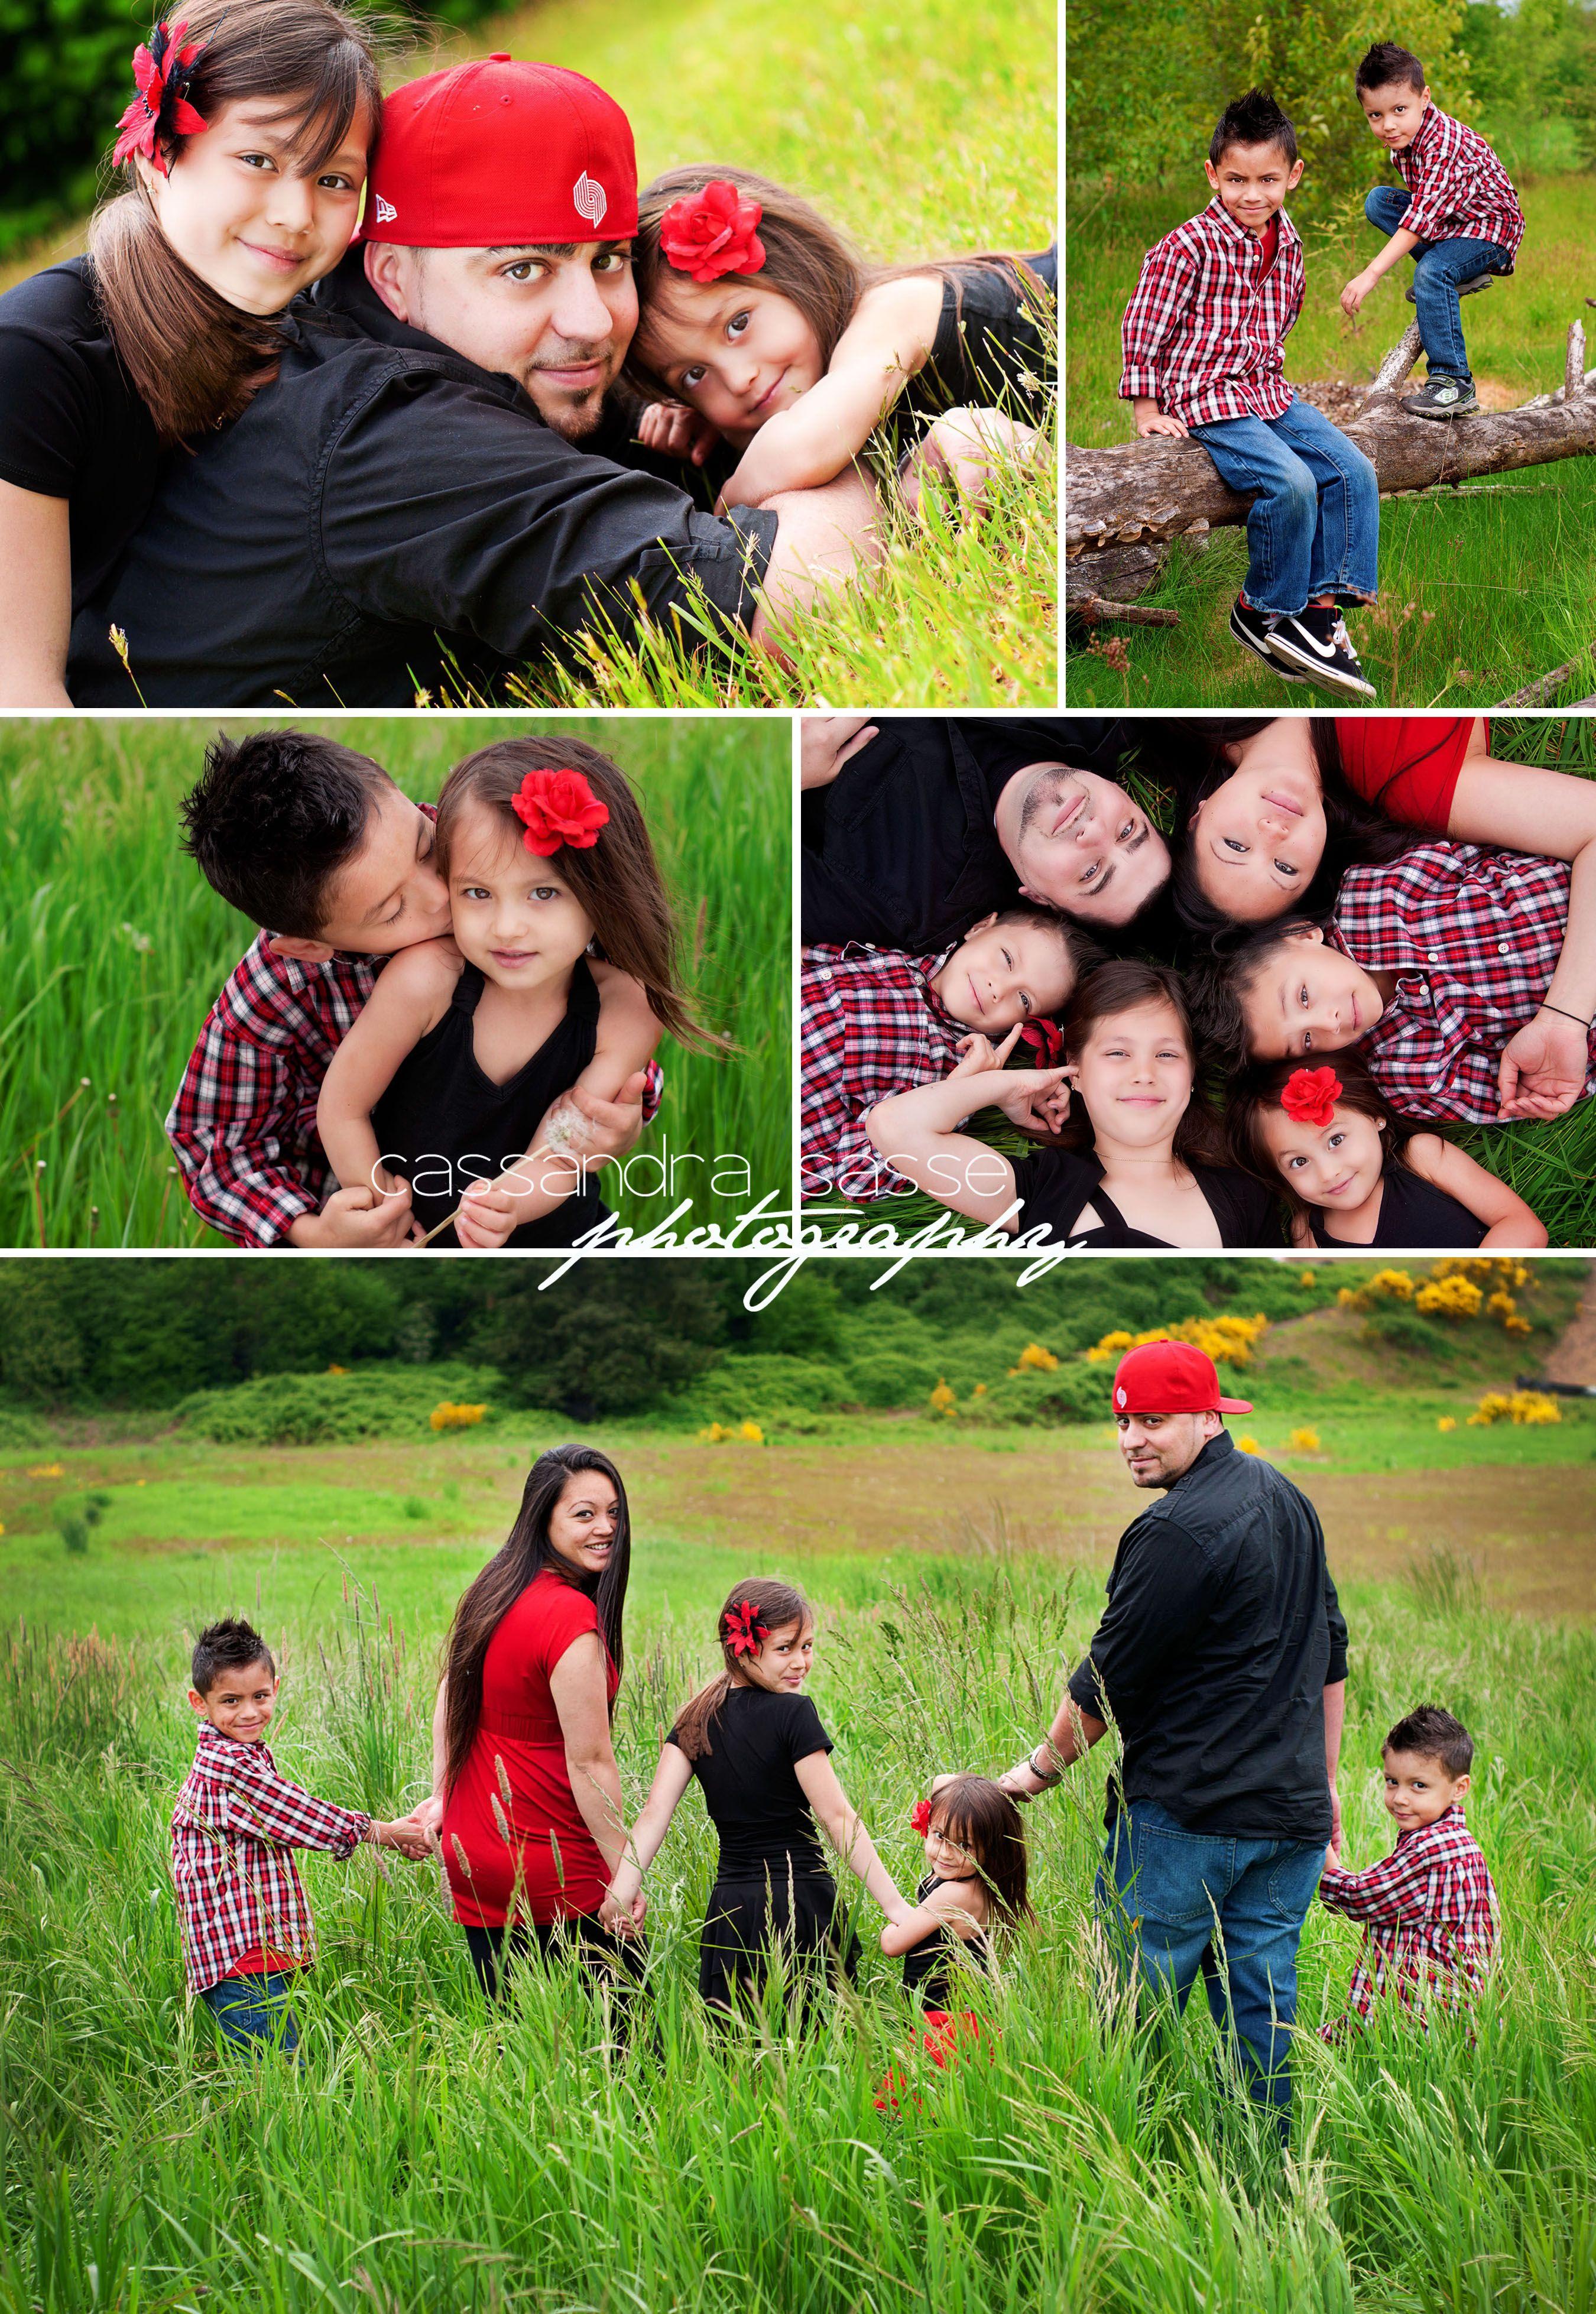 Jackie & family   Photography - Family Inspirations   Pinterest ...